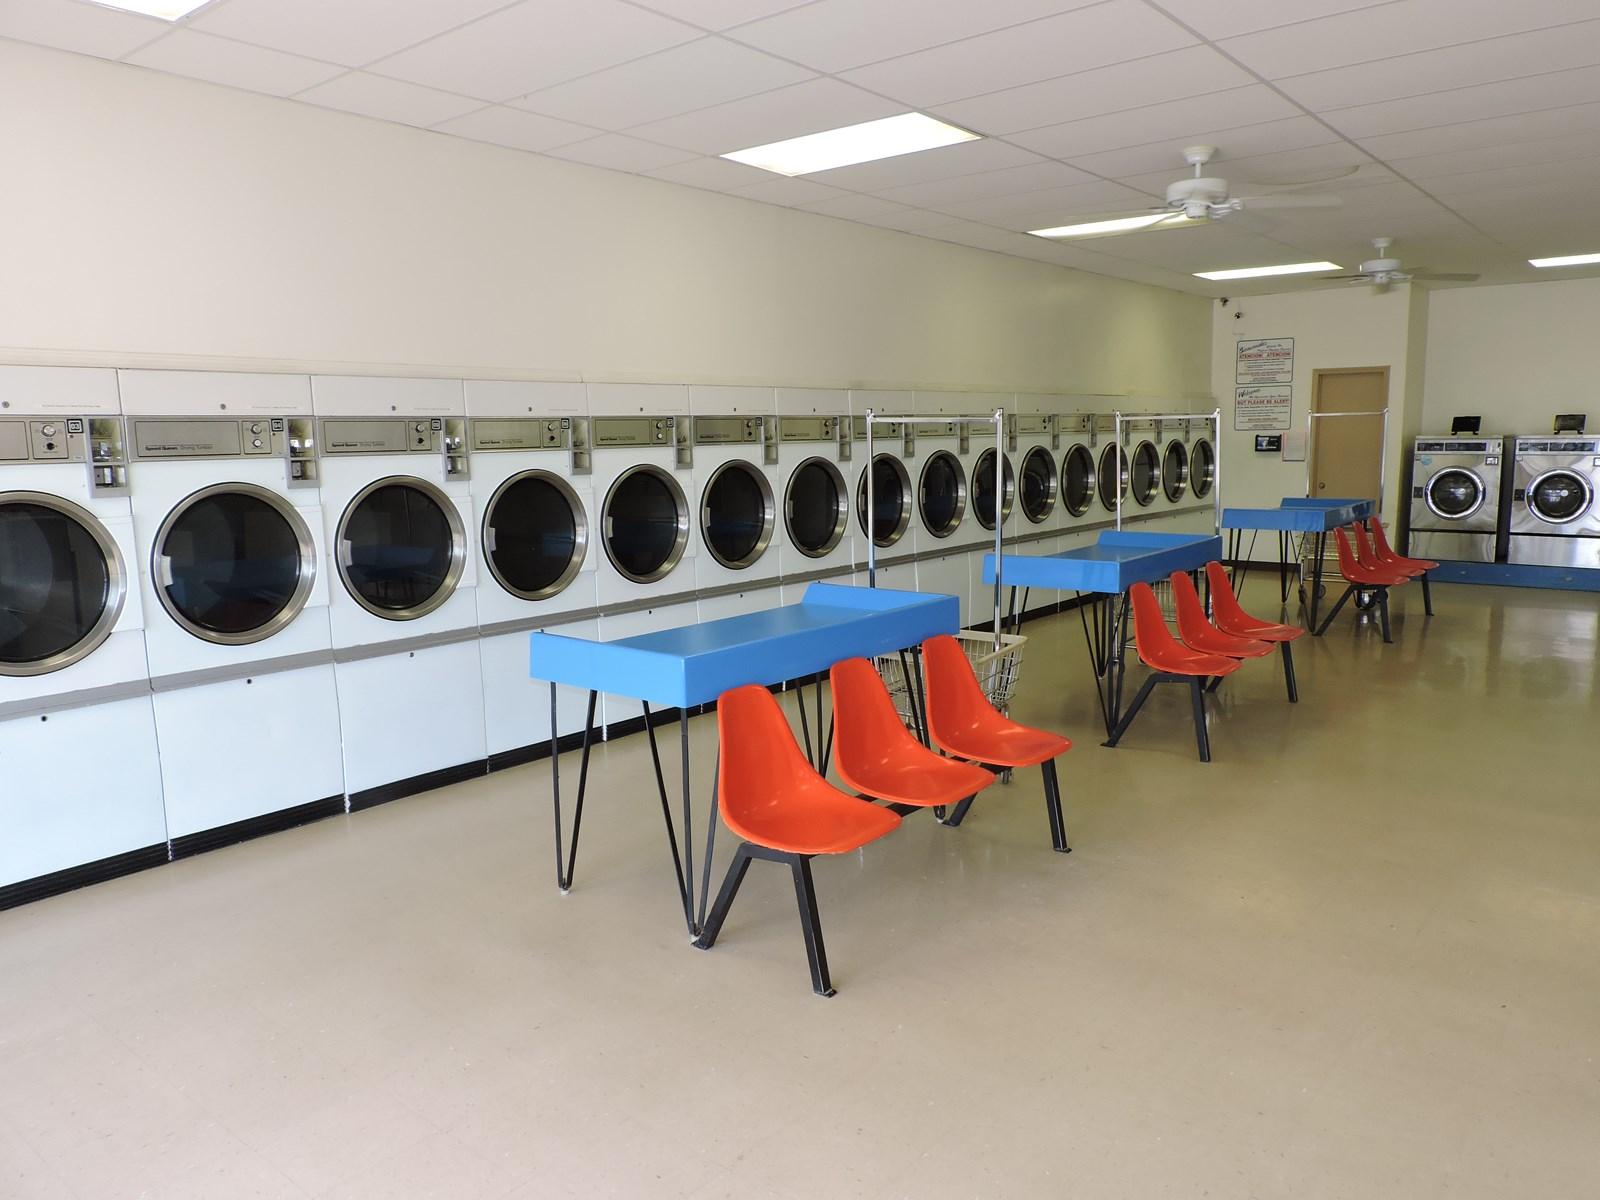 Business Laundromat For Sale Green Forest, Arkansas